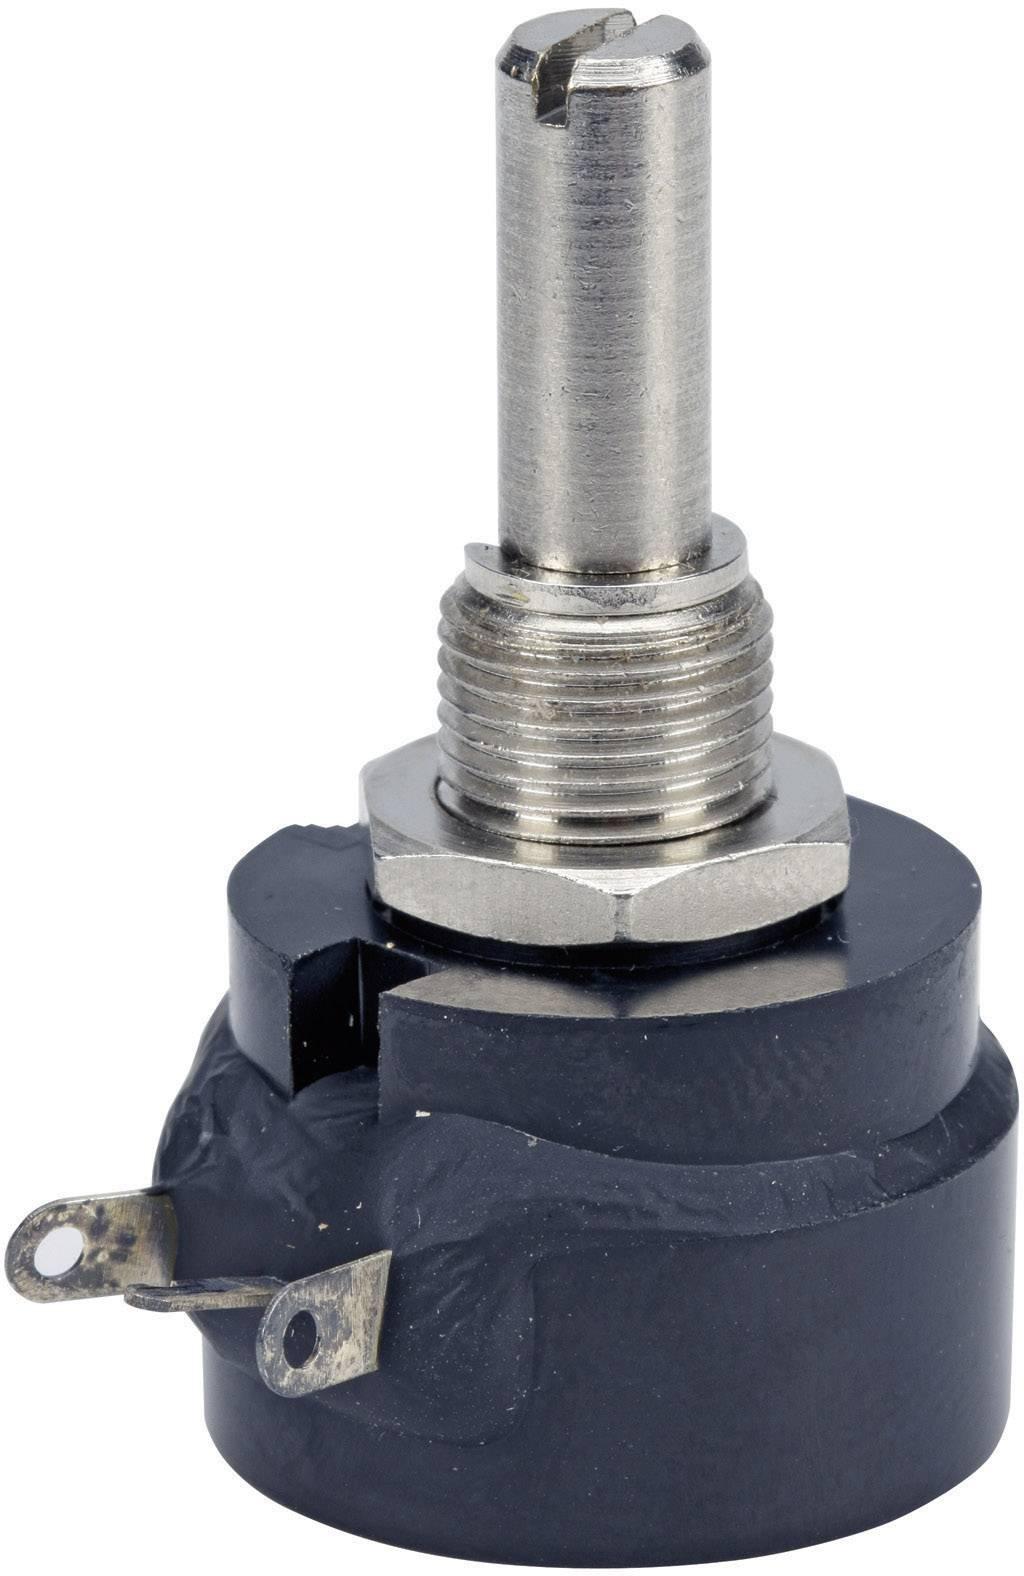 Drôtový potenciometer TT Electro, 3101206160, 5 kΩ, 0.5 W, ± 10%